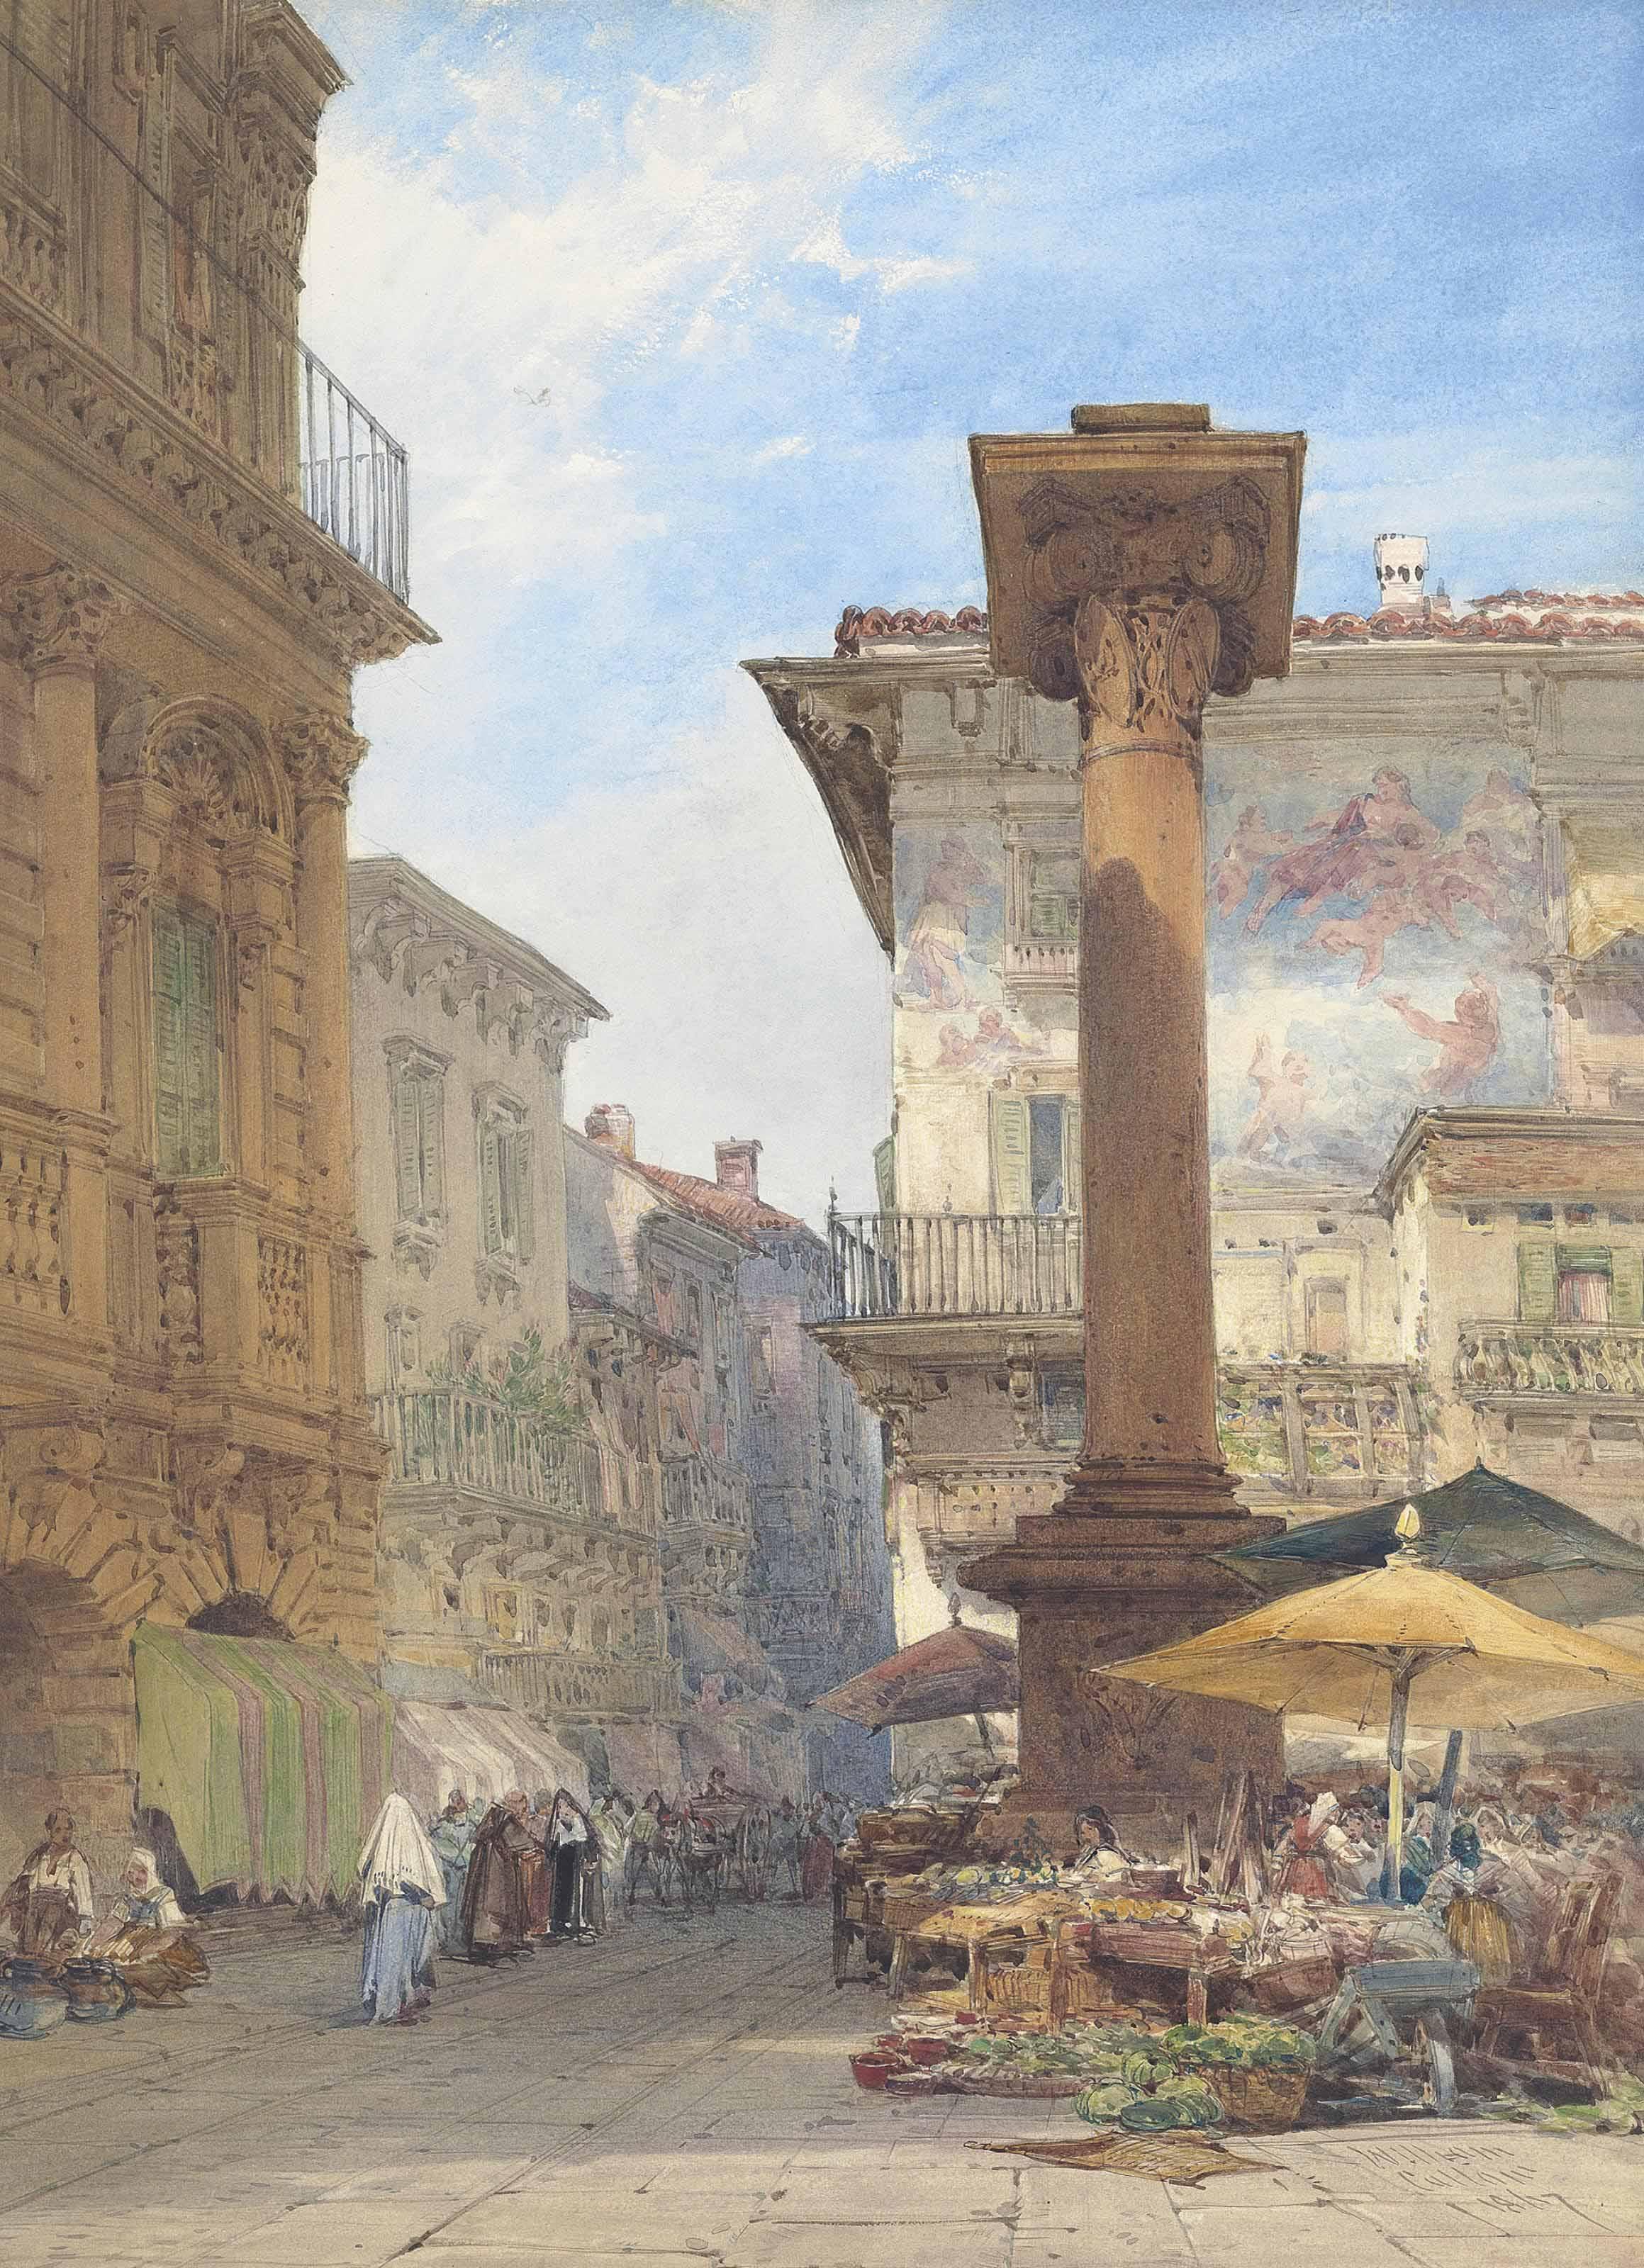 By the Venetian Column, Piazza delle Erbe, Verona, Italy